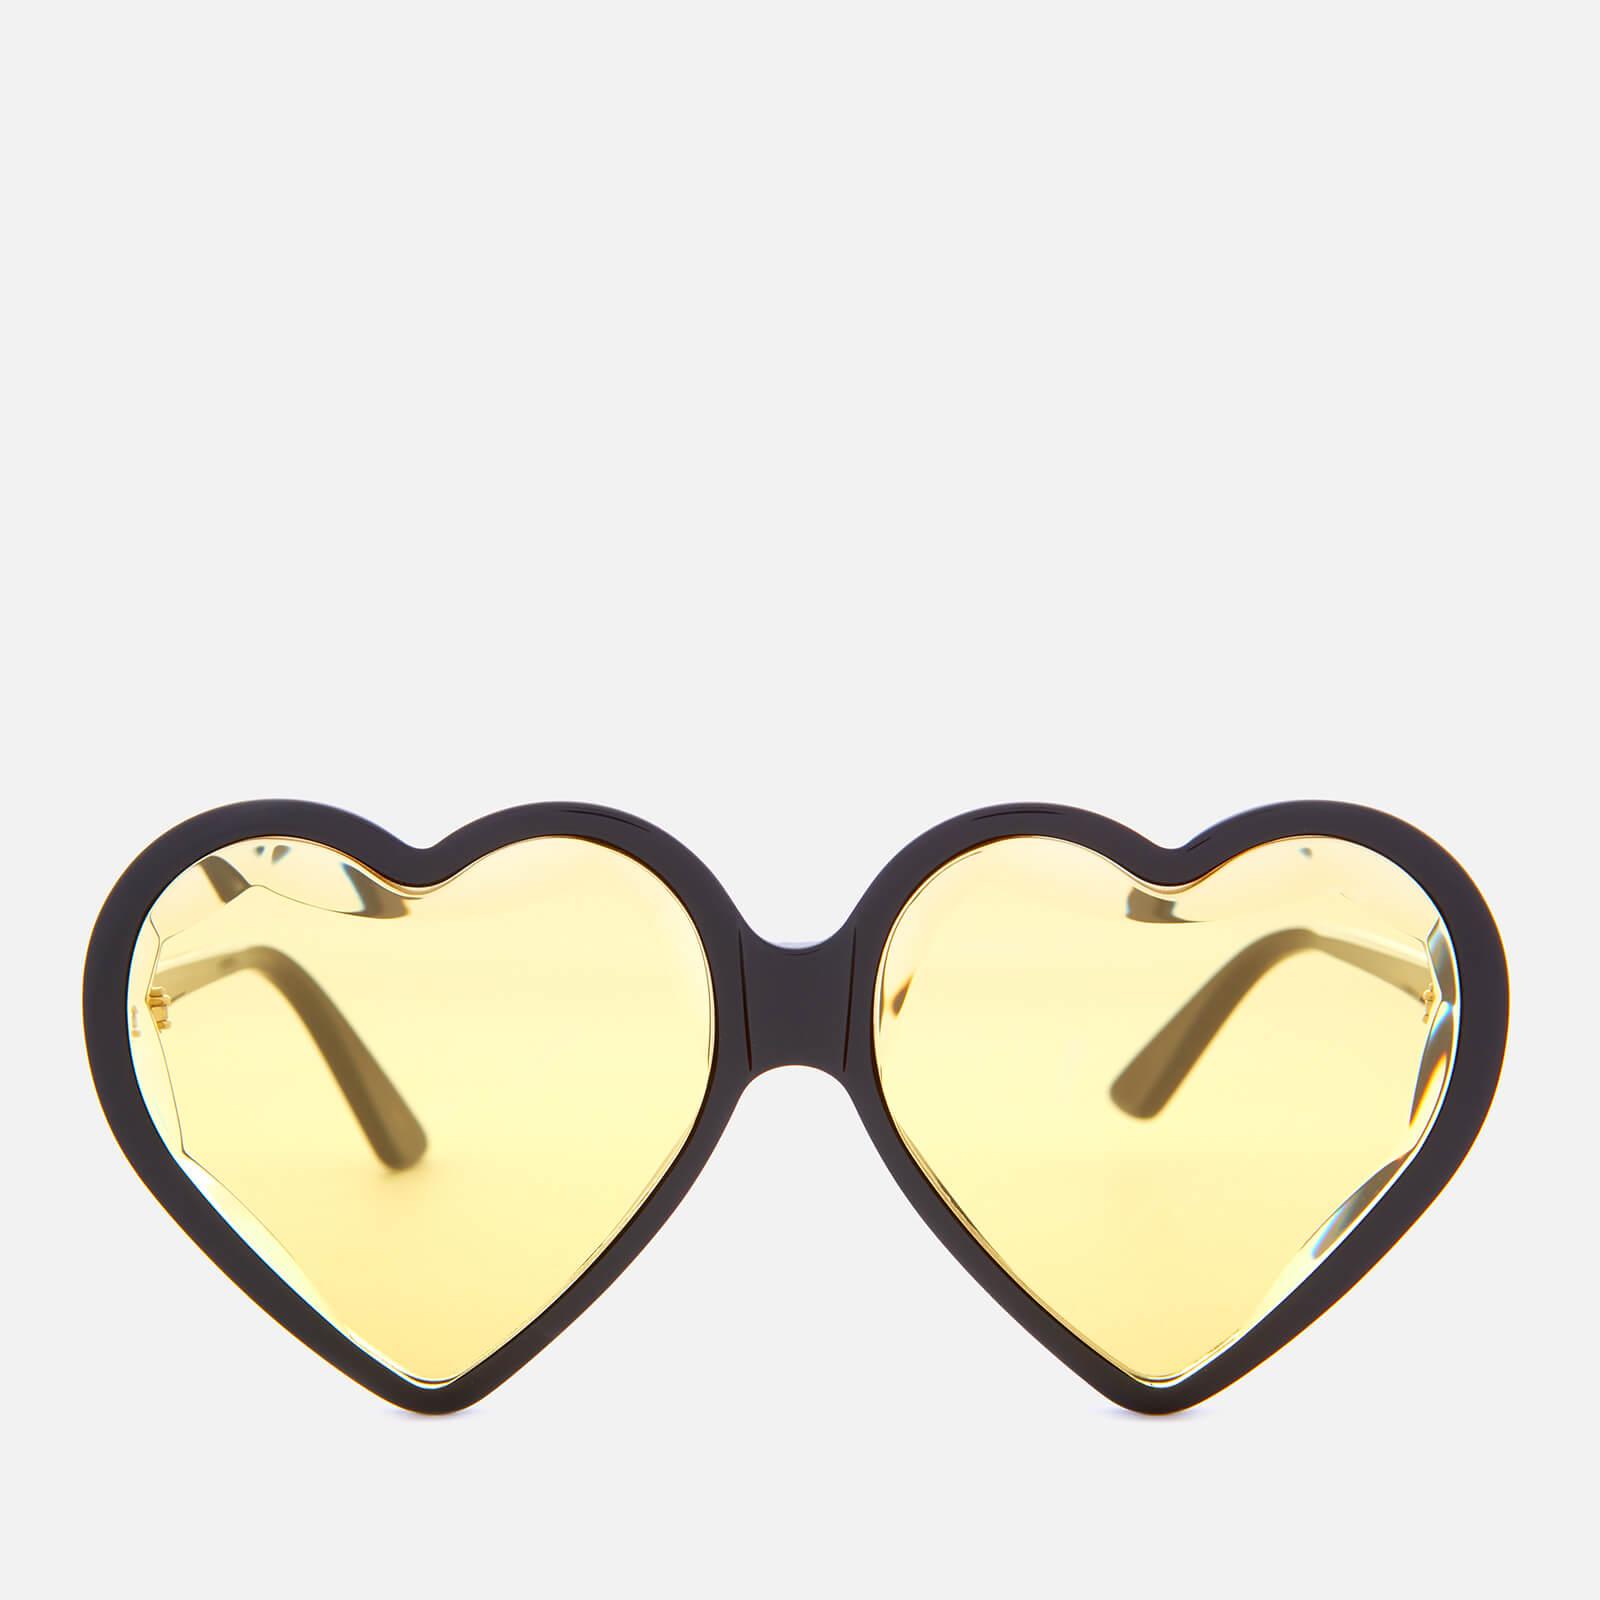 a76a741a7c Gucci Women's Acetate Heart Sunglasses - Black/Yellow